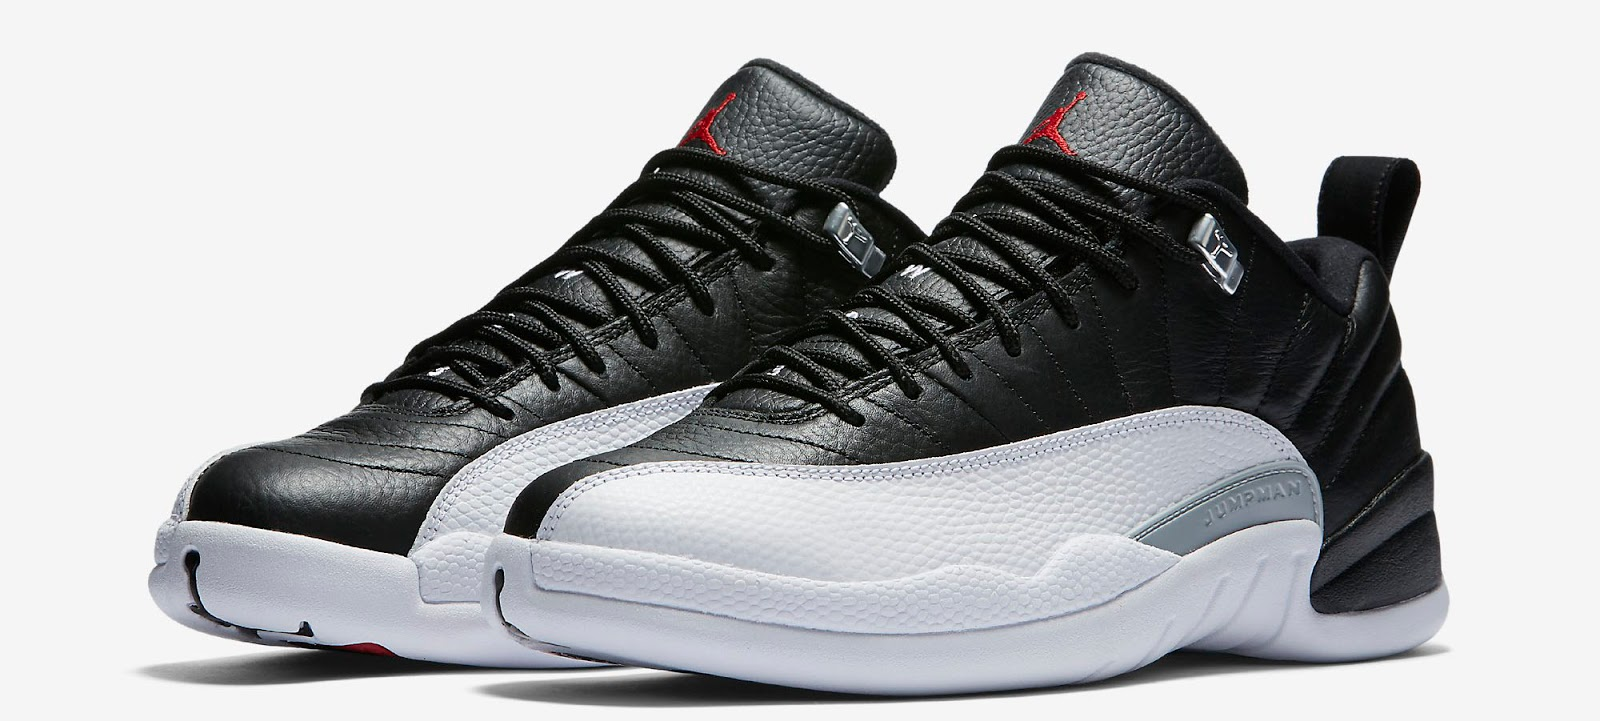 ajordanxi Your  1 Source For Sneaker Release Dates  Air Jordan 12 ... 9d92e343c